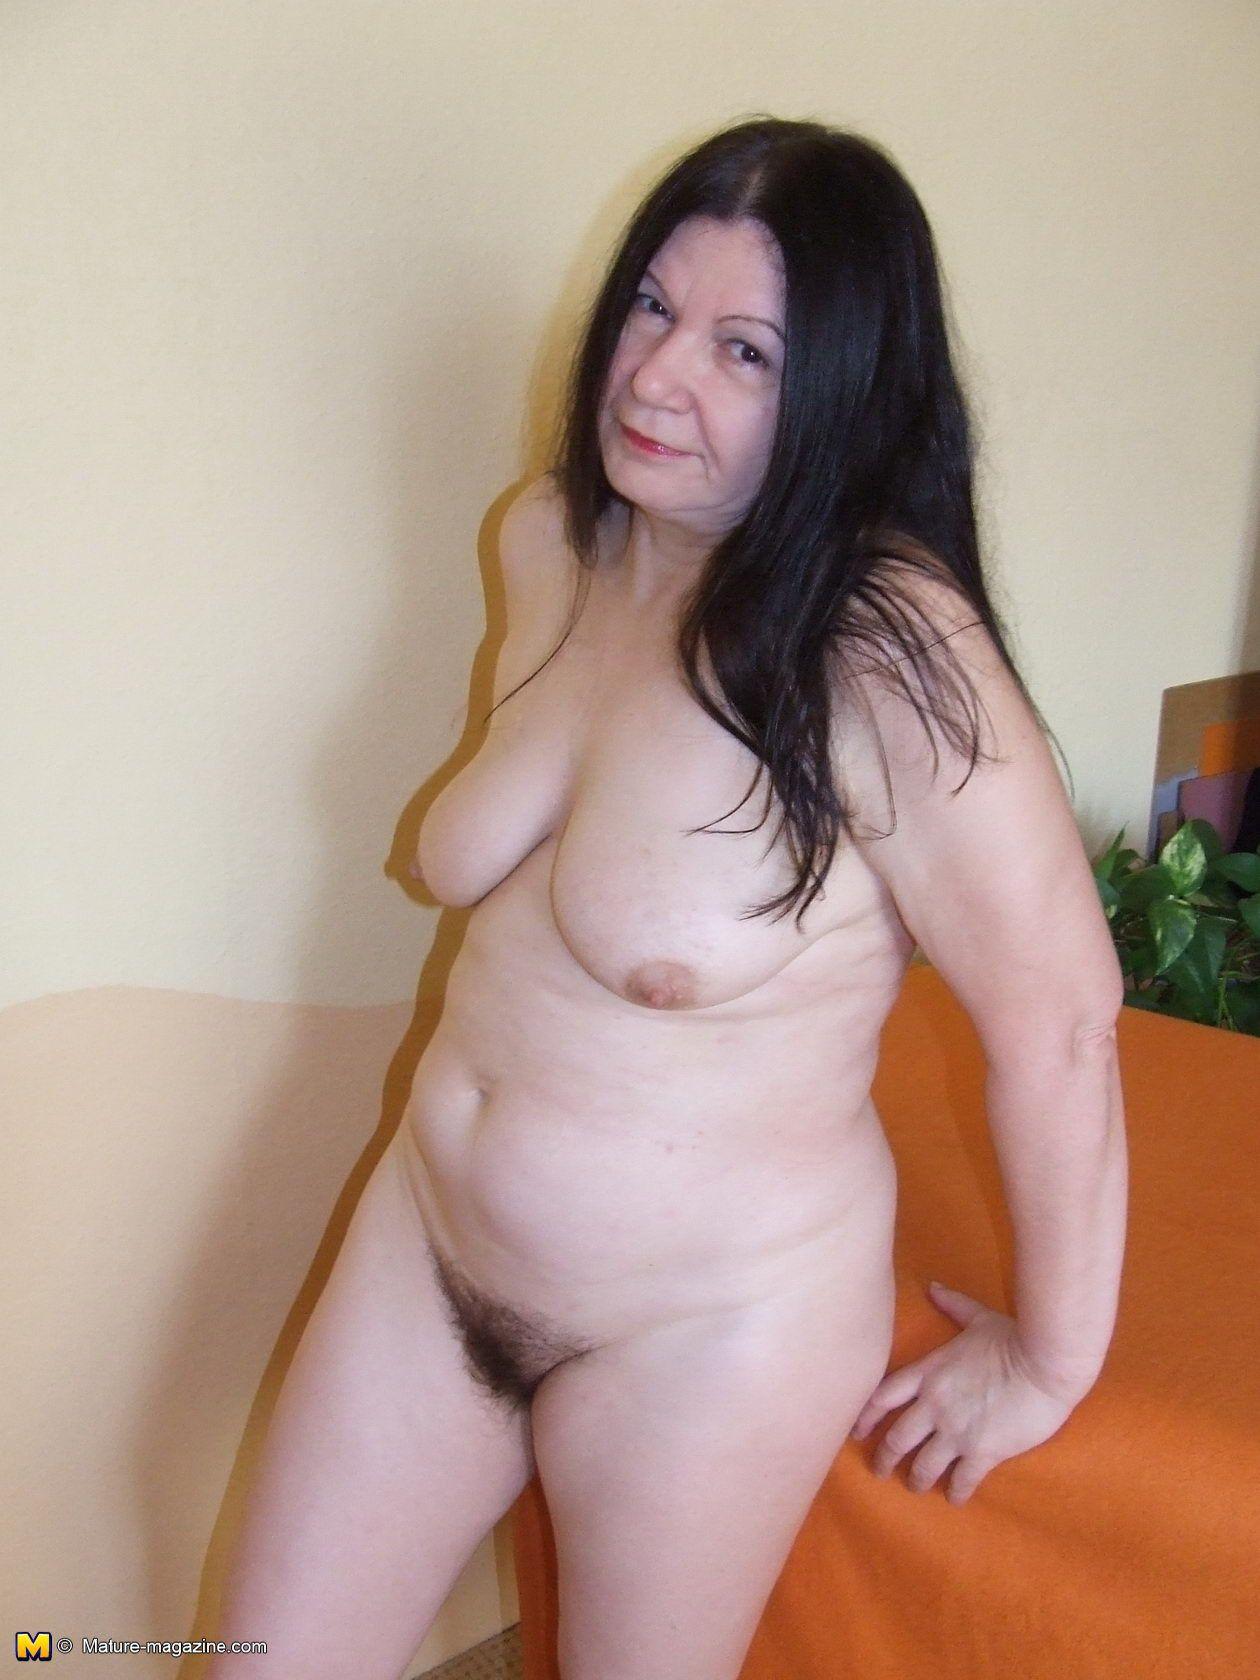 Mature black hair naked women Mature Black Hair Nude Niche Top Mature